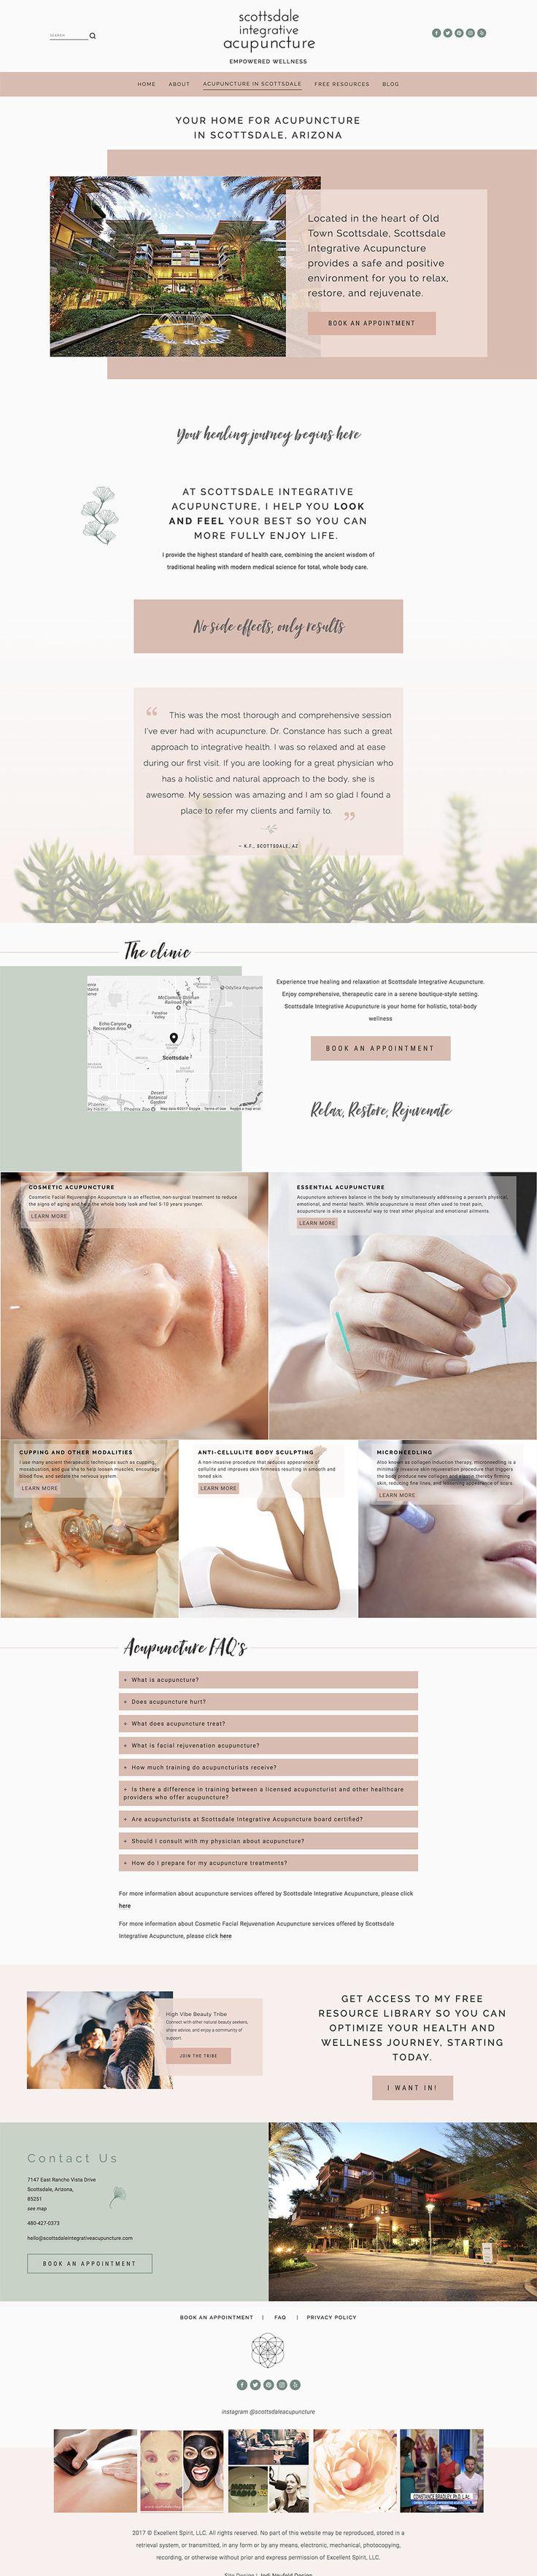 Services page design | Squarespace web design for acupunture studio | Jodi Neufeld Design